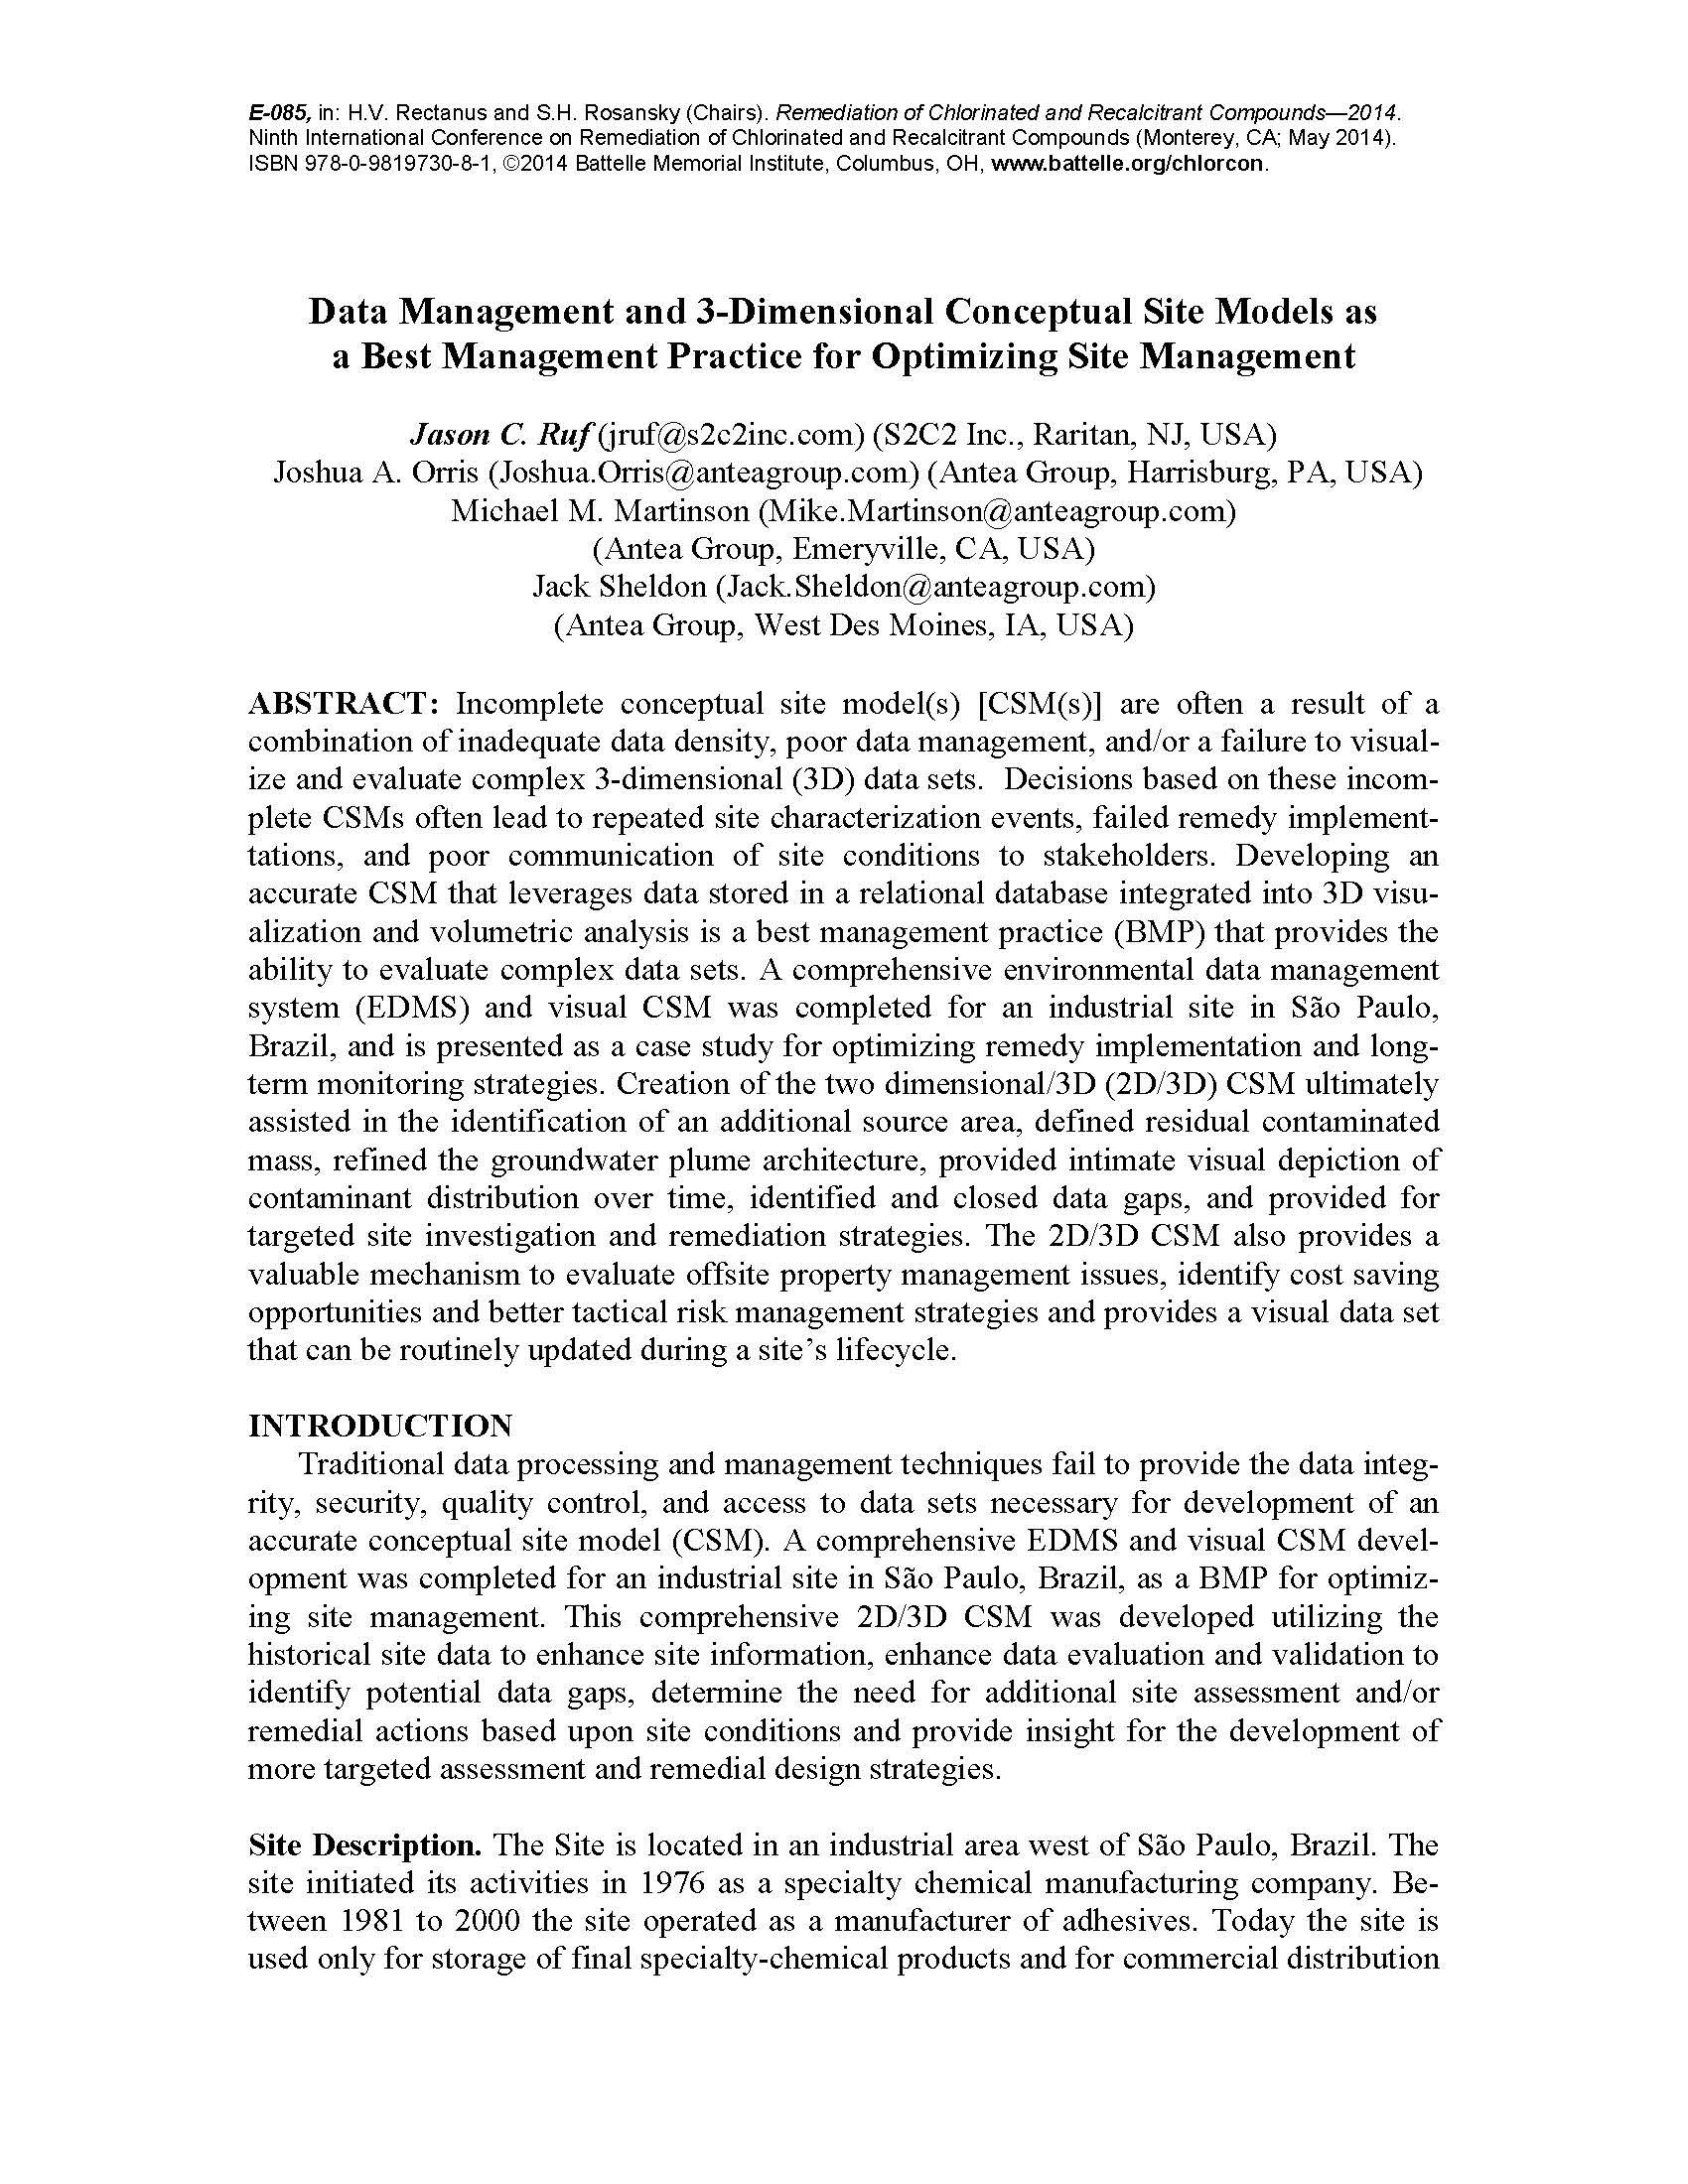 S2C2 Battelle Paper 2014